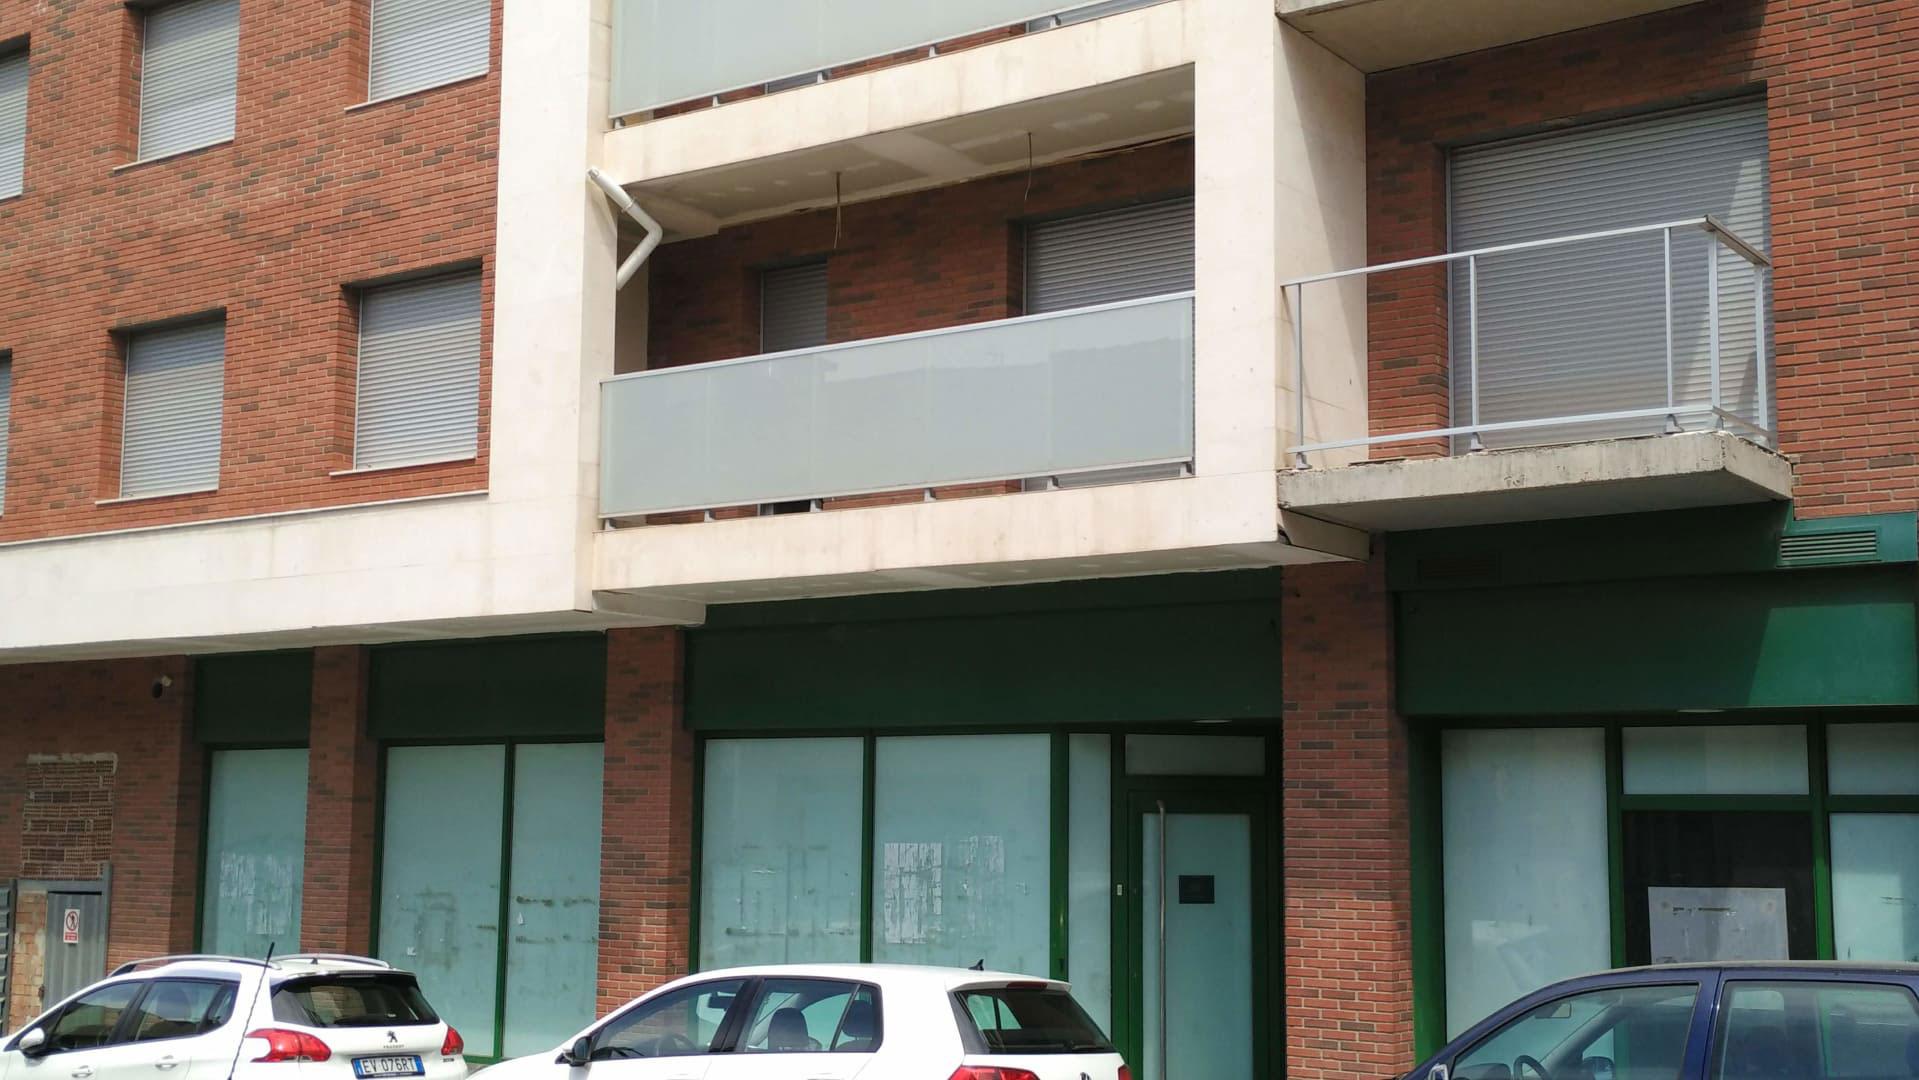 Local en venta en Bellpuig, Lleida, Plaza Folch Ramon, 463.013 €, 171 m2